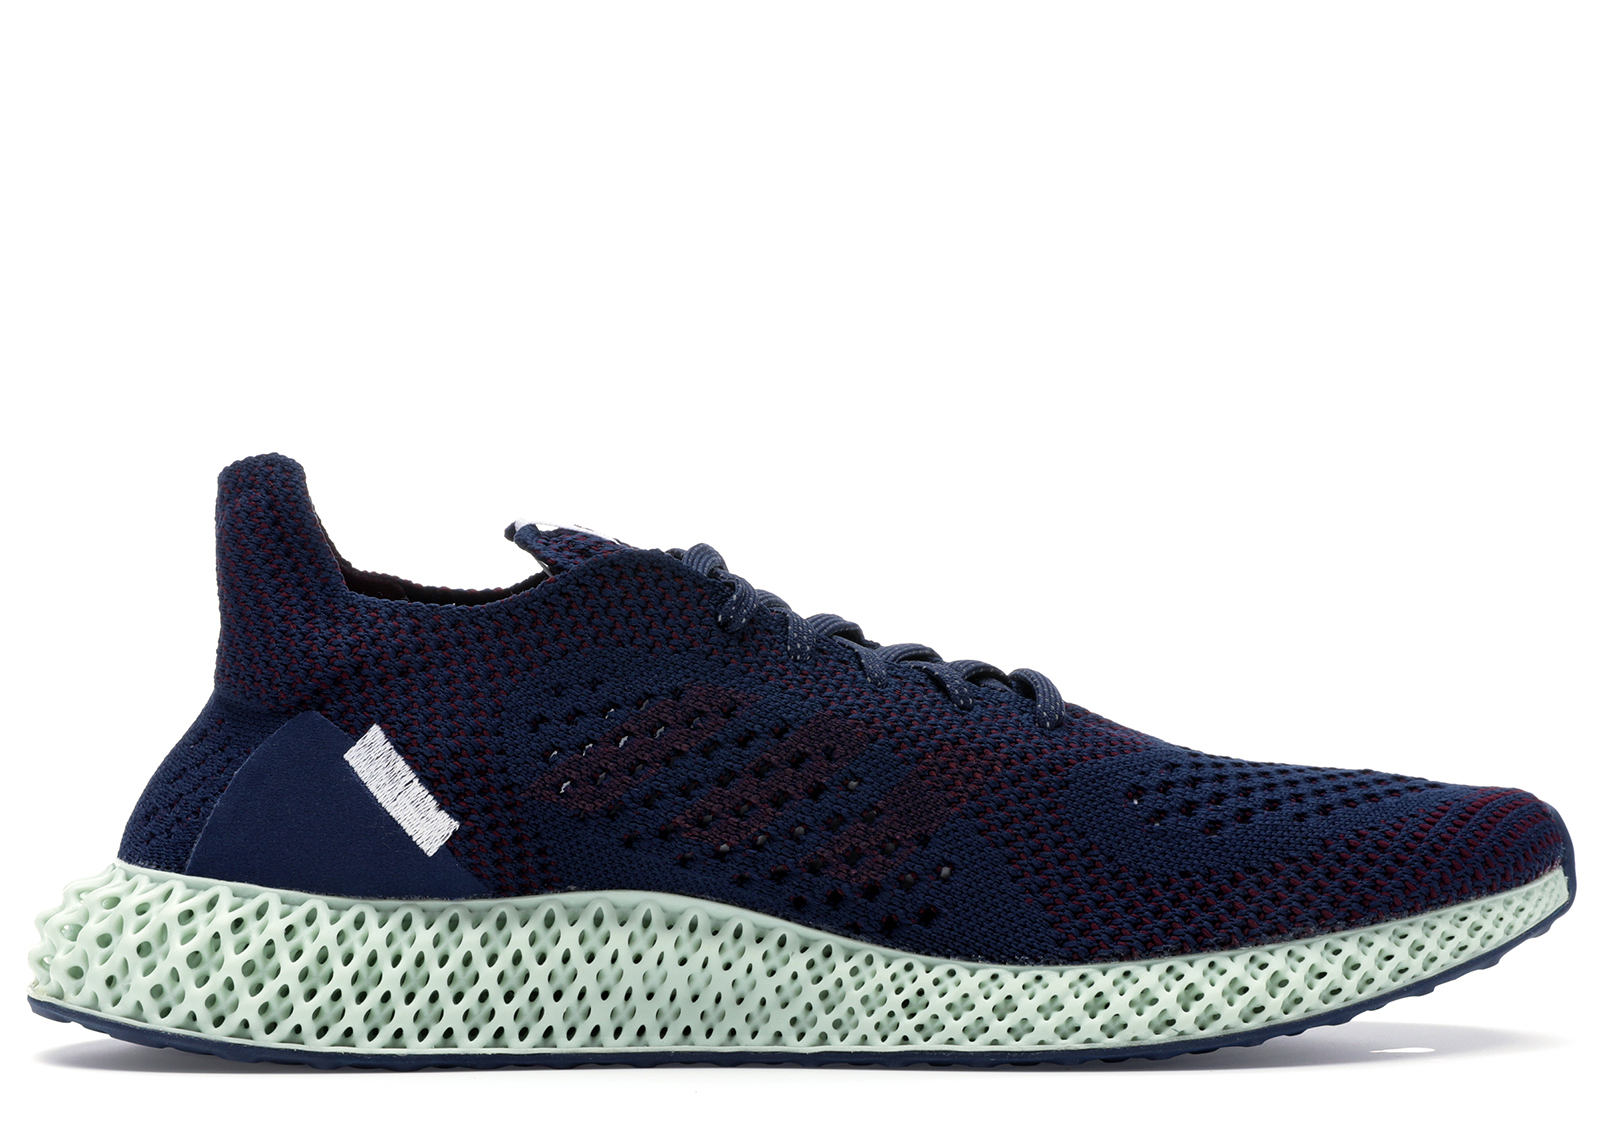 adidas consortium runner mid 4d stockx